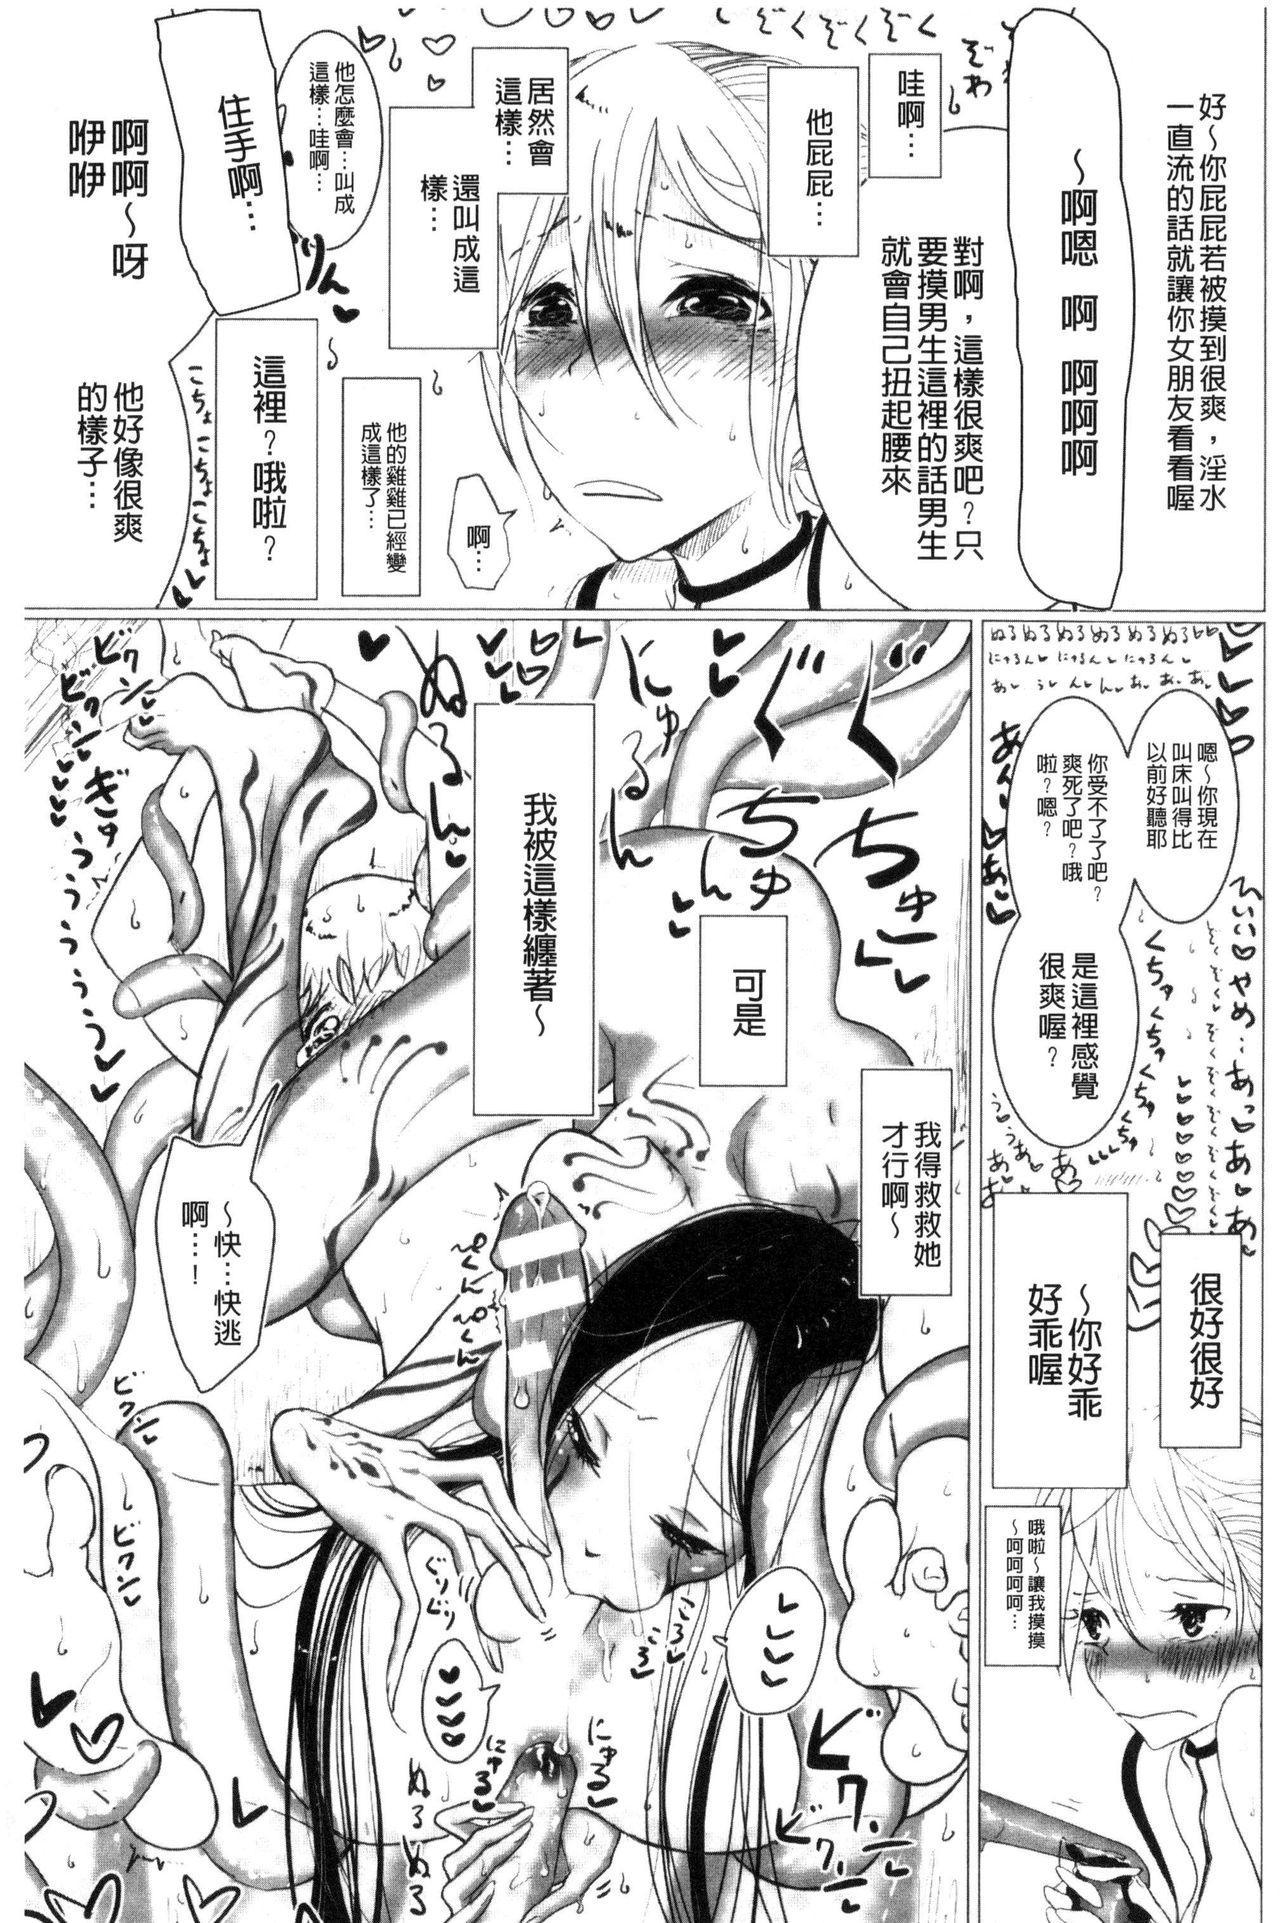 [Dhibi] Sono Yubisaki de Korogashite - Please Caress it at the Finger-tip. [Chinese] 142